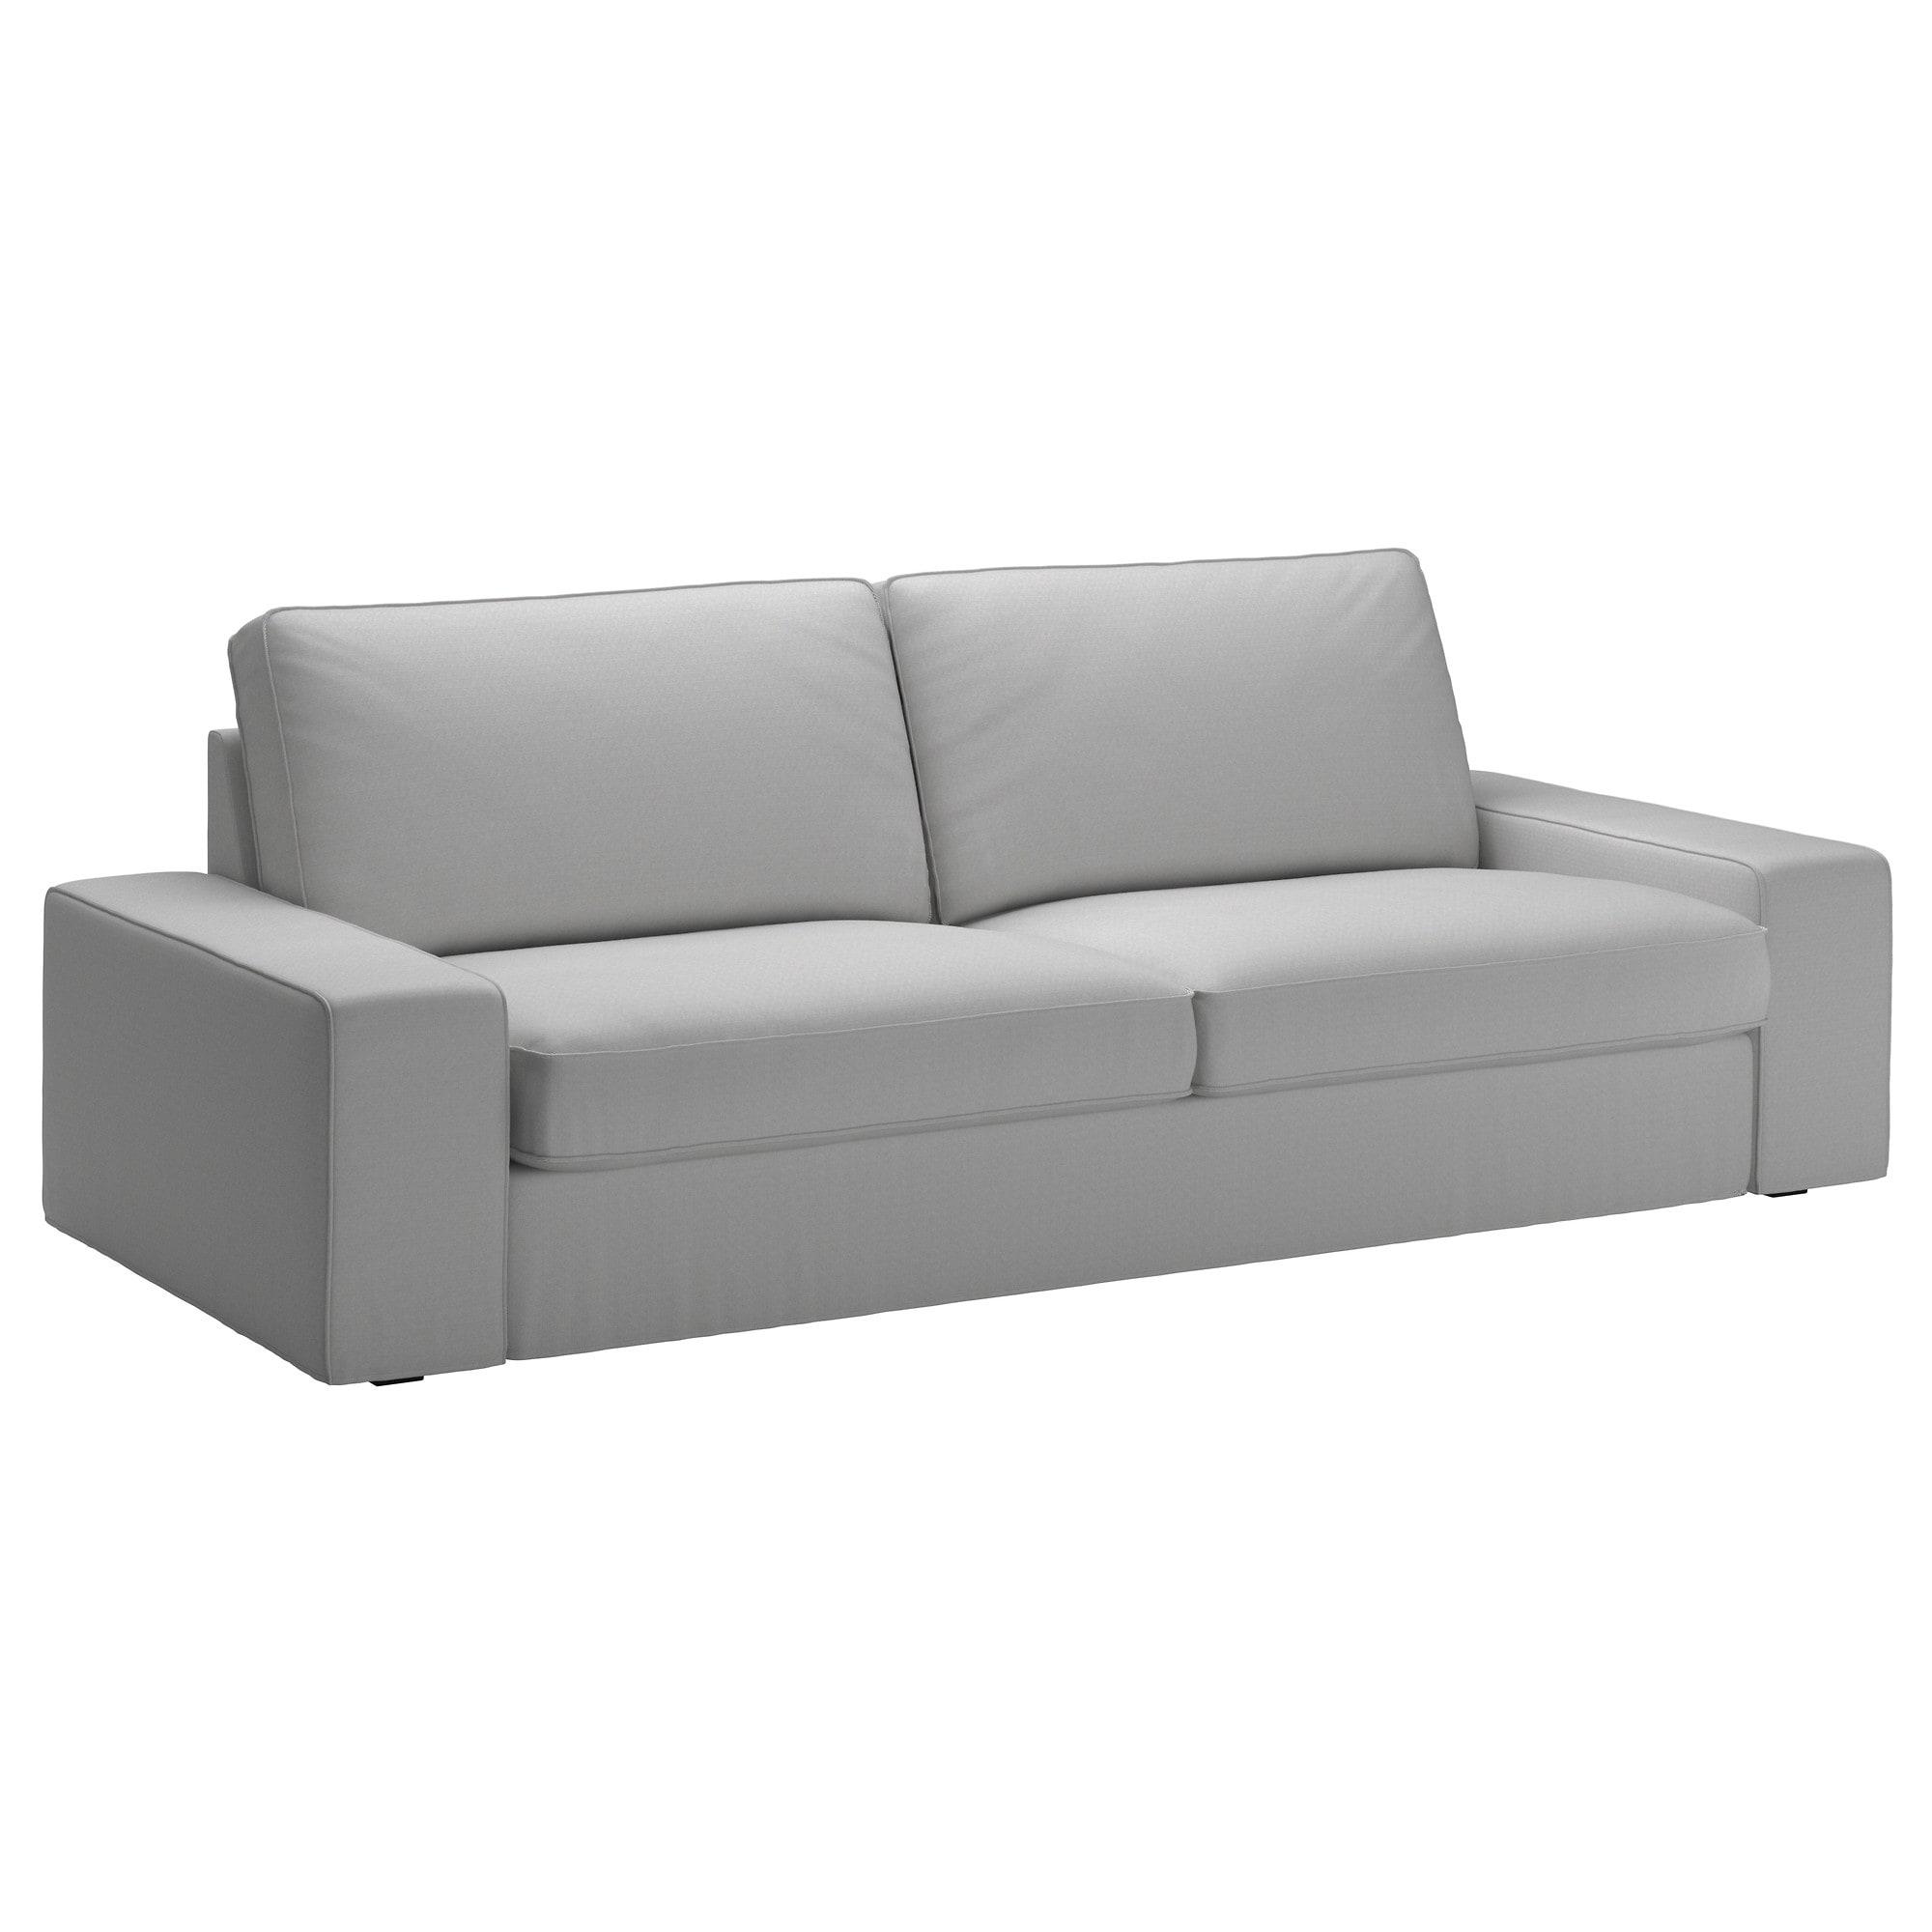 Sofa Kivik 3 Plazas Txdf Kivik sofà 3 Plazas orrsta Gris Claro Ikea